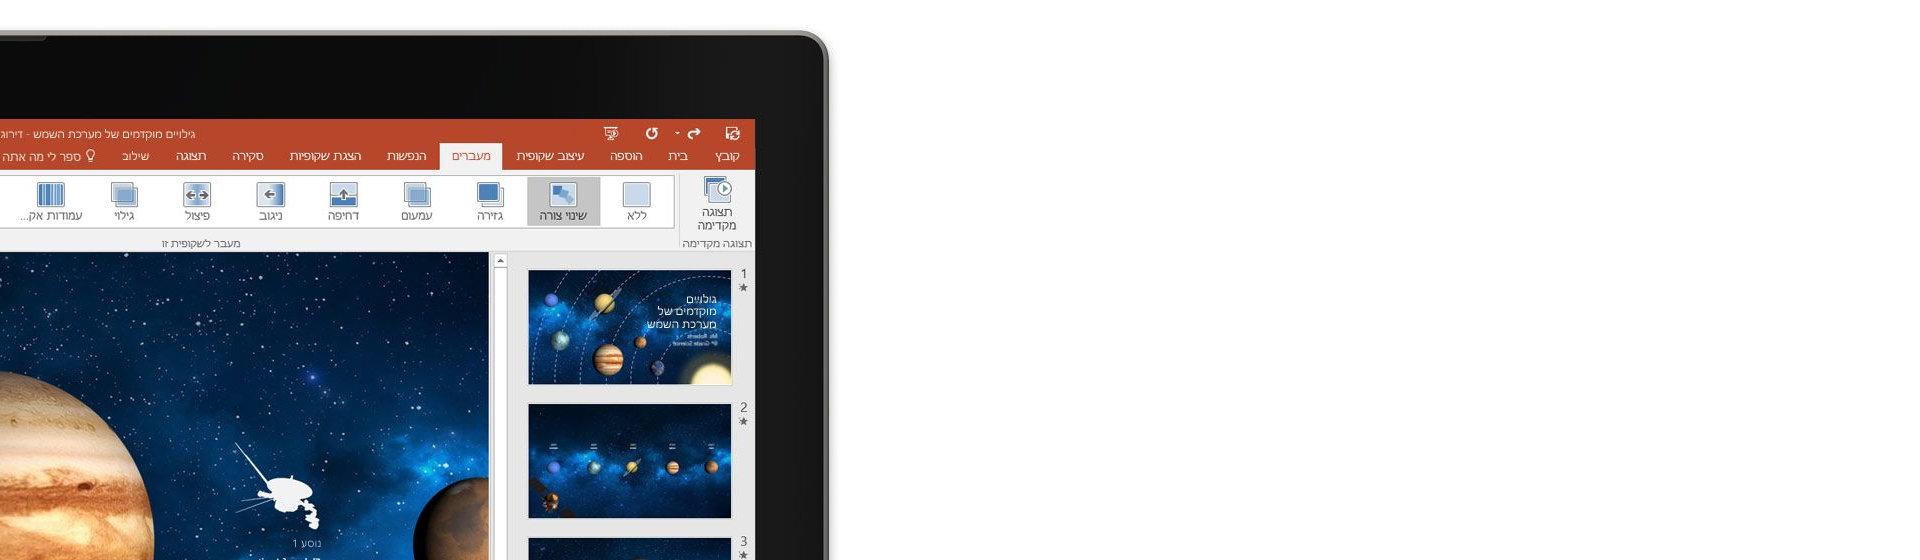 Tablet המציג את התכונה 'שינוי צורה' בשקופית של מצגת PowerPoint.